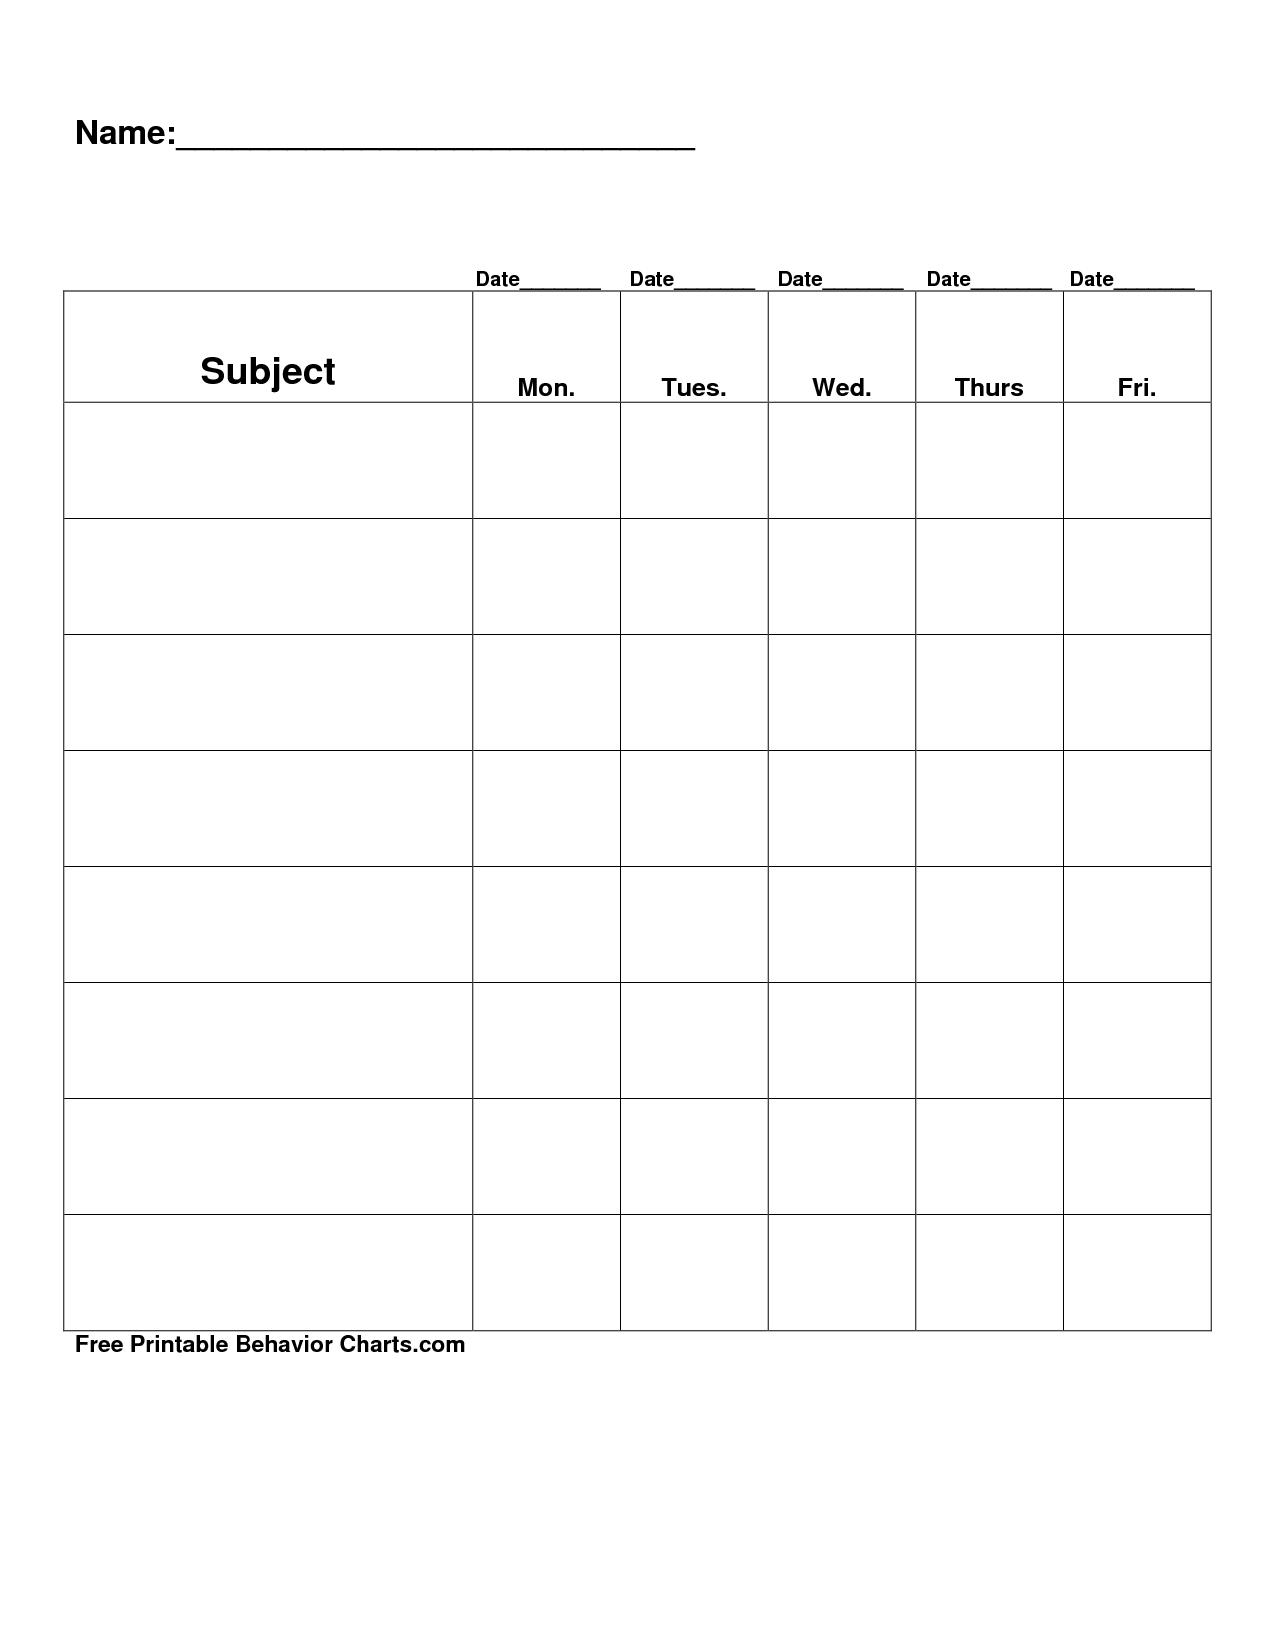 Free Printable Blank Charts   Free Printable Behavior Charts Com - Free Printable Behavior Charts For Elementary Students